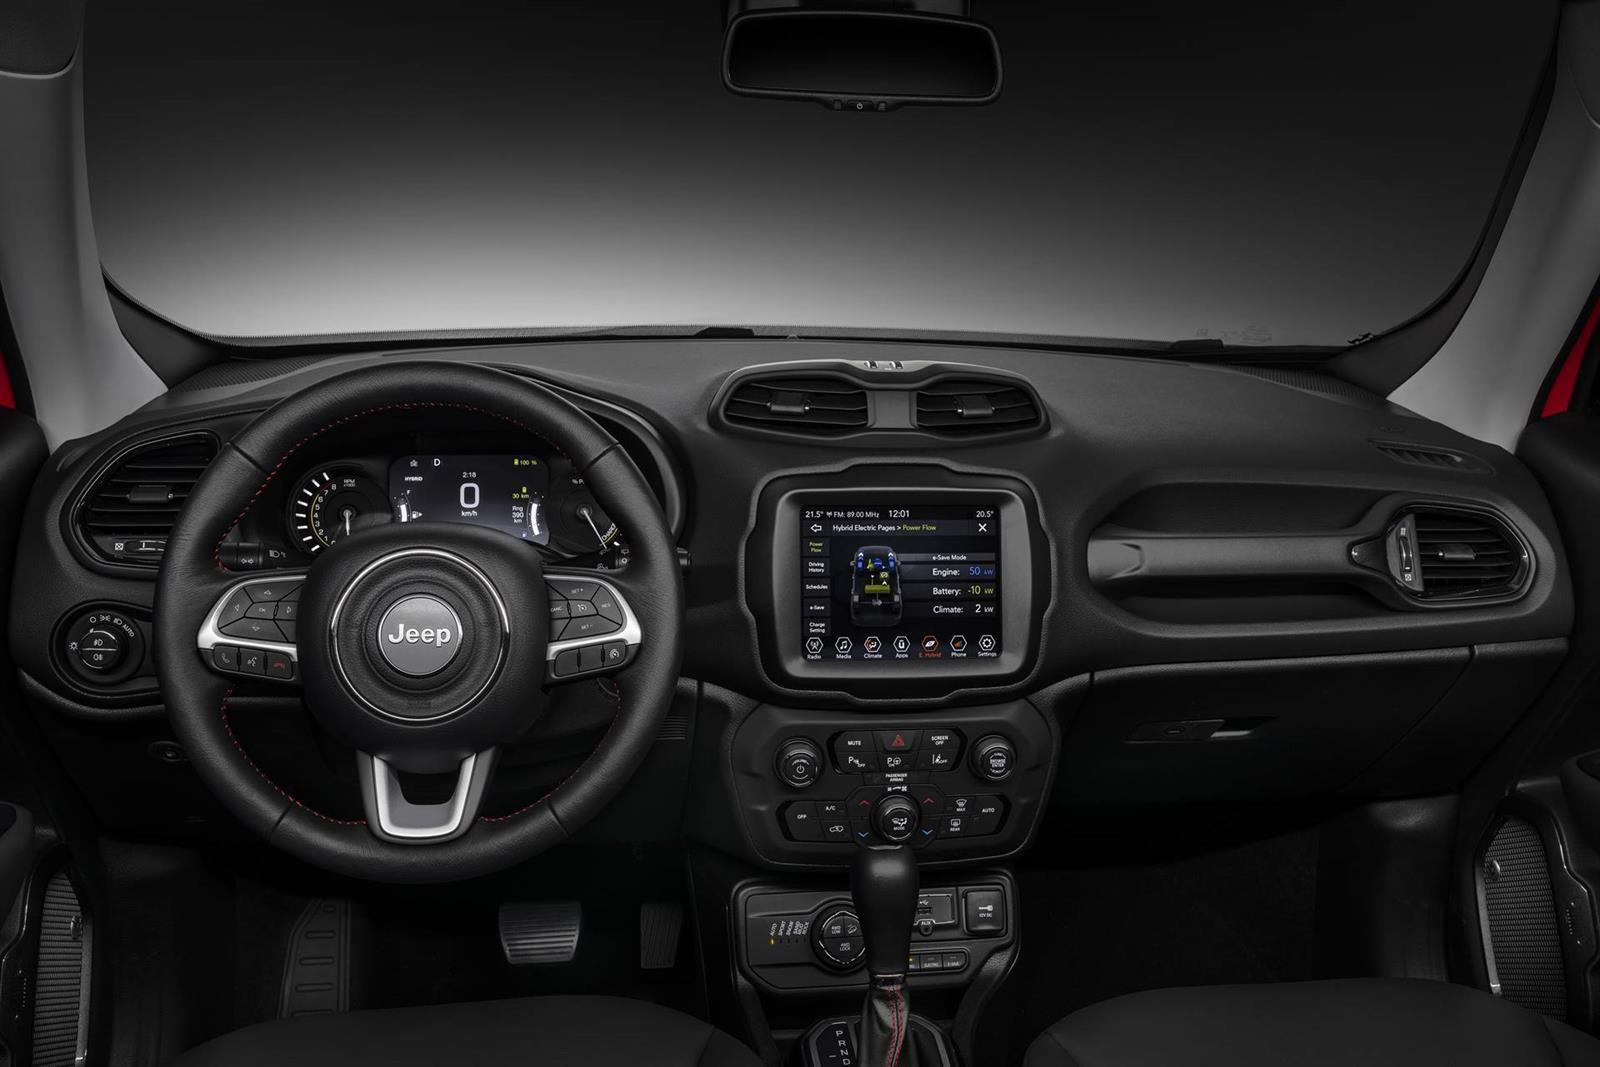 2019 Jeep Renegade PHEV